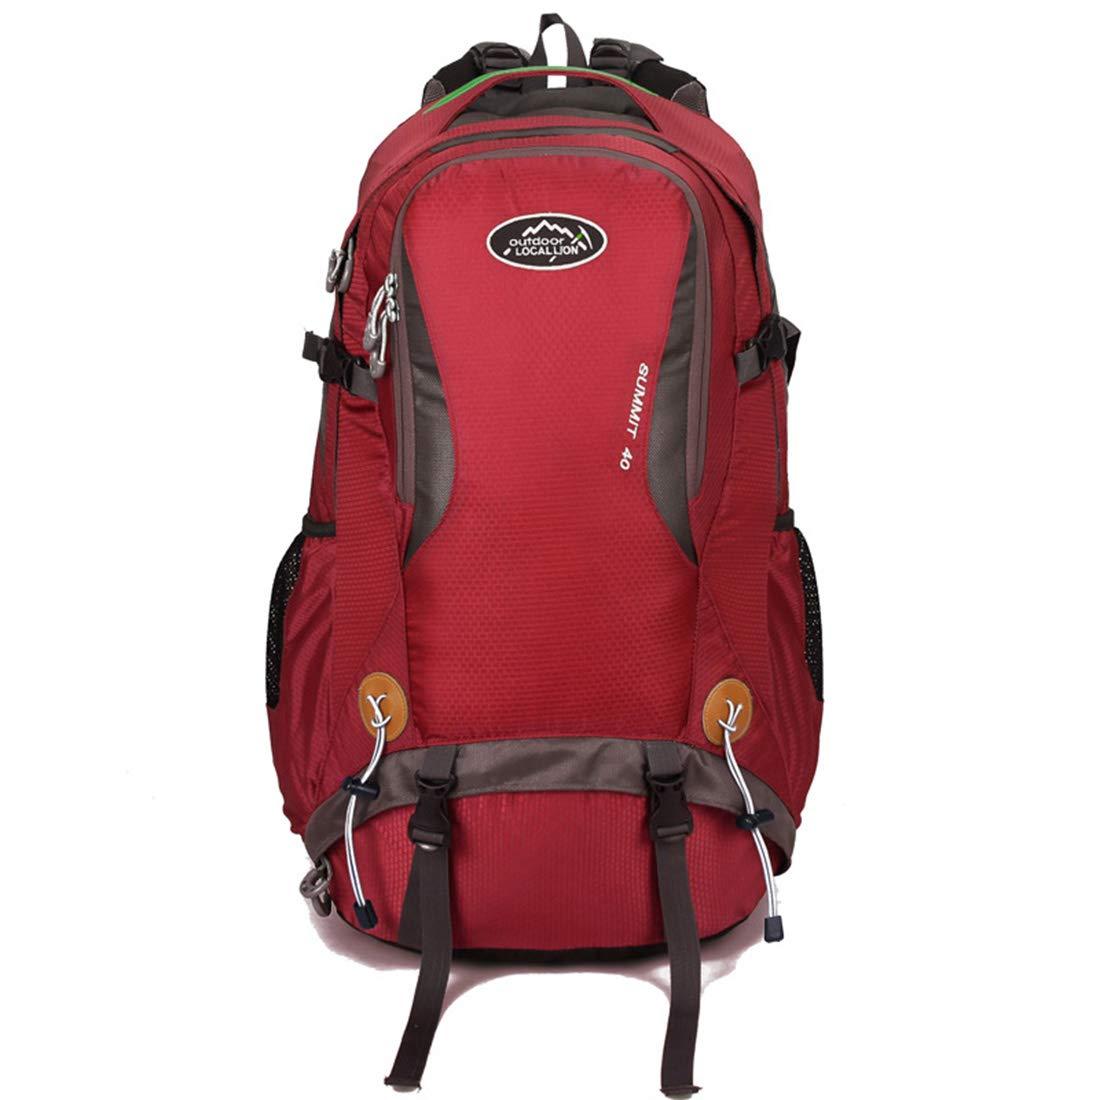 8878186f0188 Amazon.com: RABILTY Backpacks Polyester Waterproof and Wearable ...